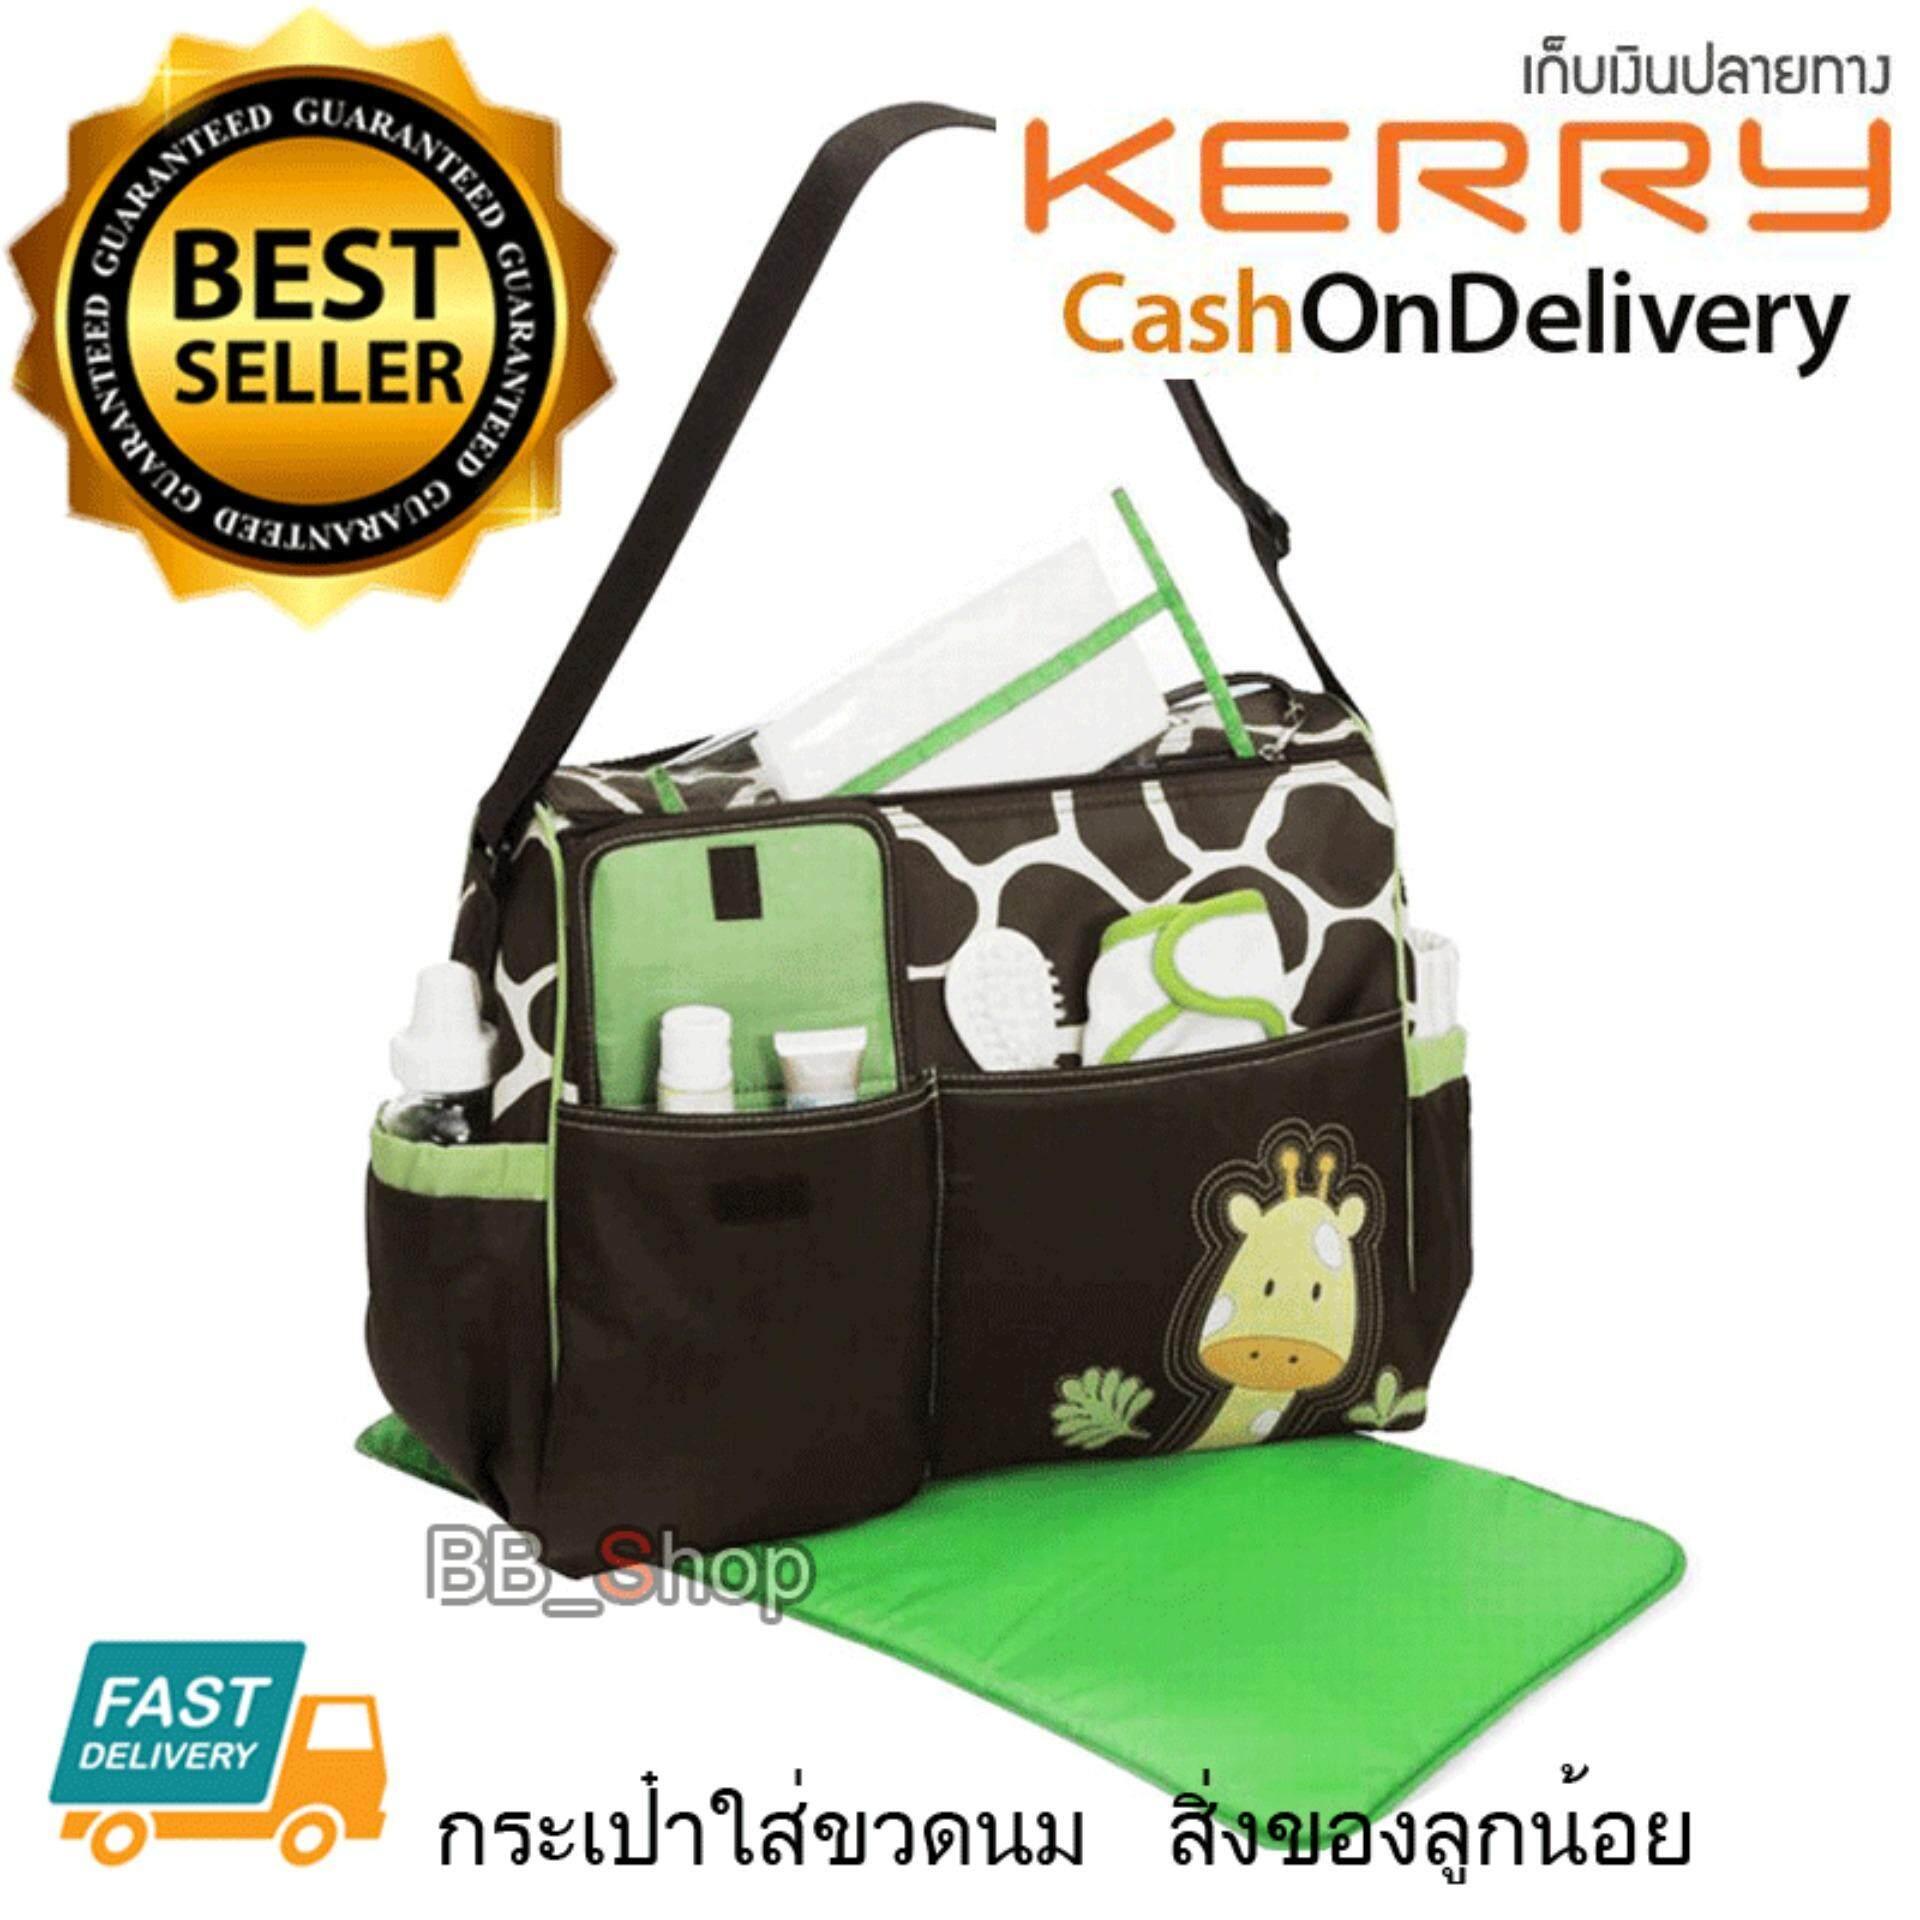 Baby Stroller Bagกระเป๋าใส่ขวดนม กระเป๋าใส่นมแม่ กระเป๋าใส่ผ้าอ้อม กระเป๋าคุณแม่ สิ่งของลูกน้อย ลายยีราฟ.